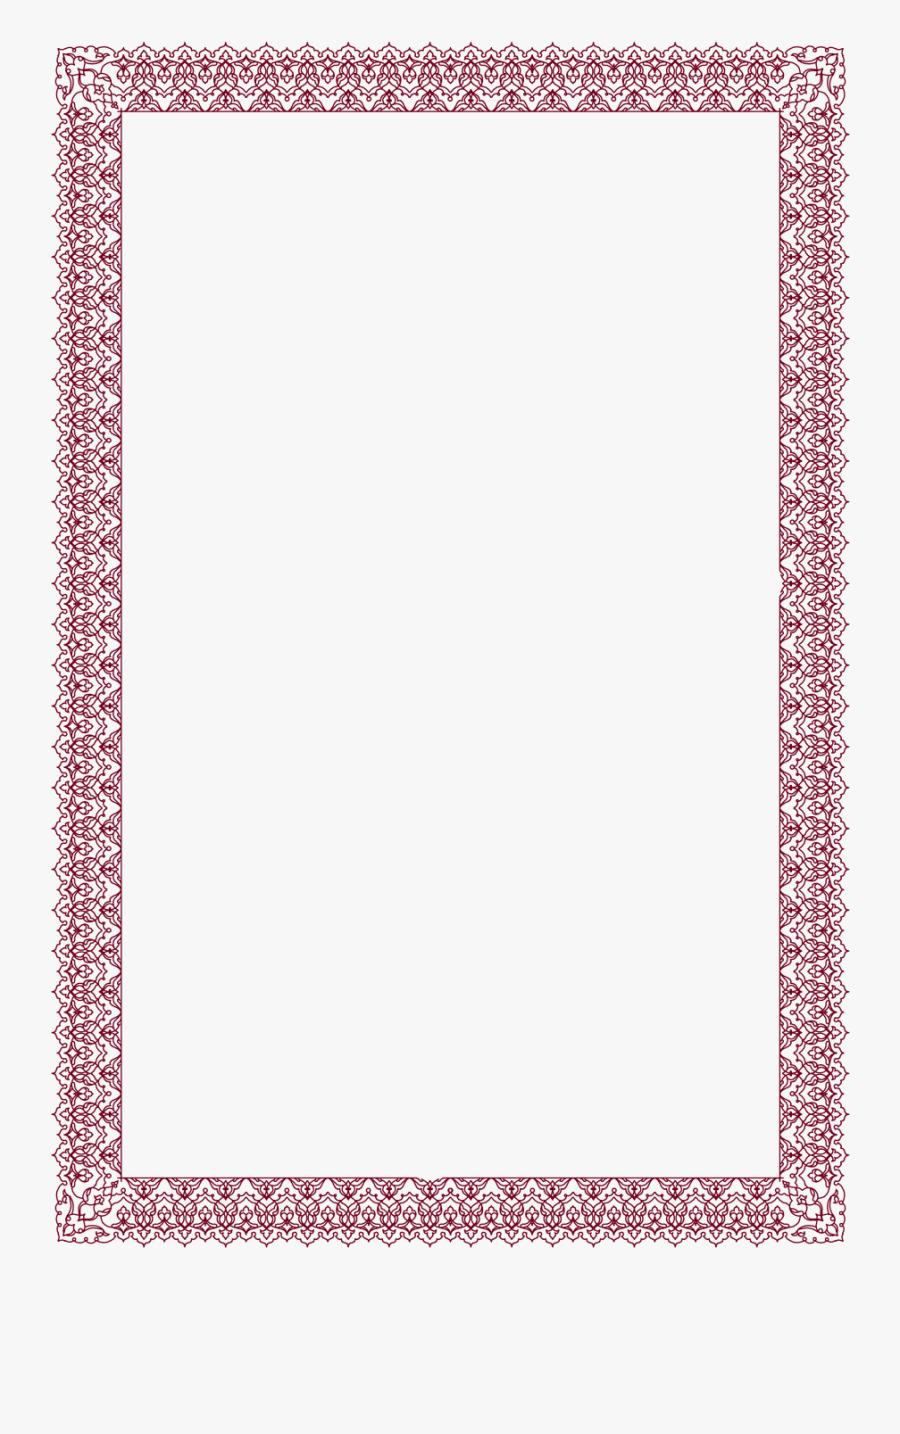 Arabic Border Png : arabic, border, Border, Arabic, Frame, Transparent, Clipart, ClipartKey